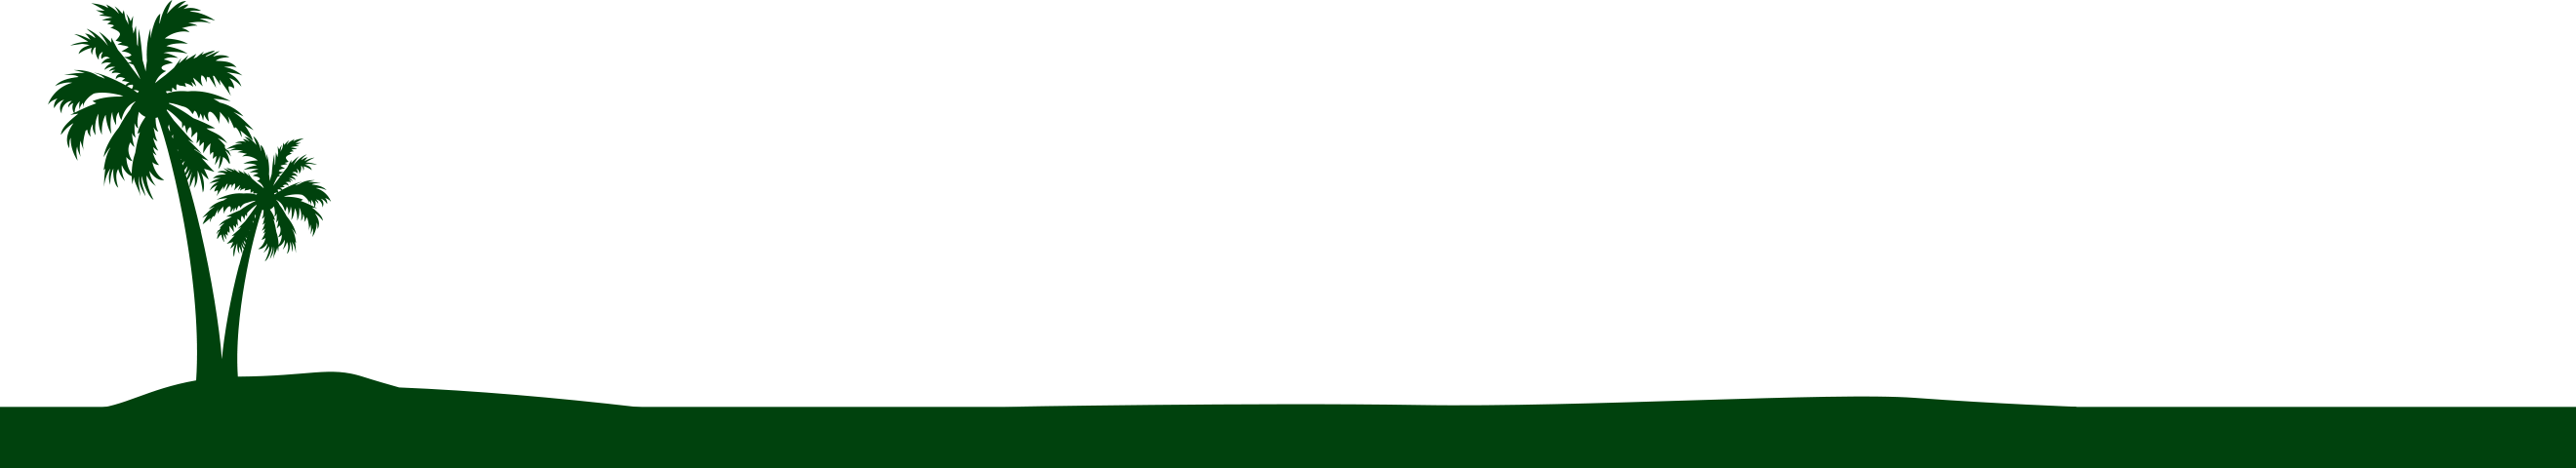 Bessey Creek Dental Care Palms Tree Background | Dr. Steven Kline, Palm City Dentist serving Palm City, Martin Downs, Stuart, Port St. Lucie, Port Salerno and Martin County.